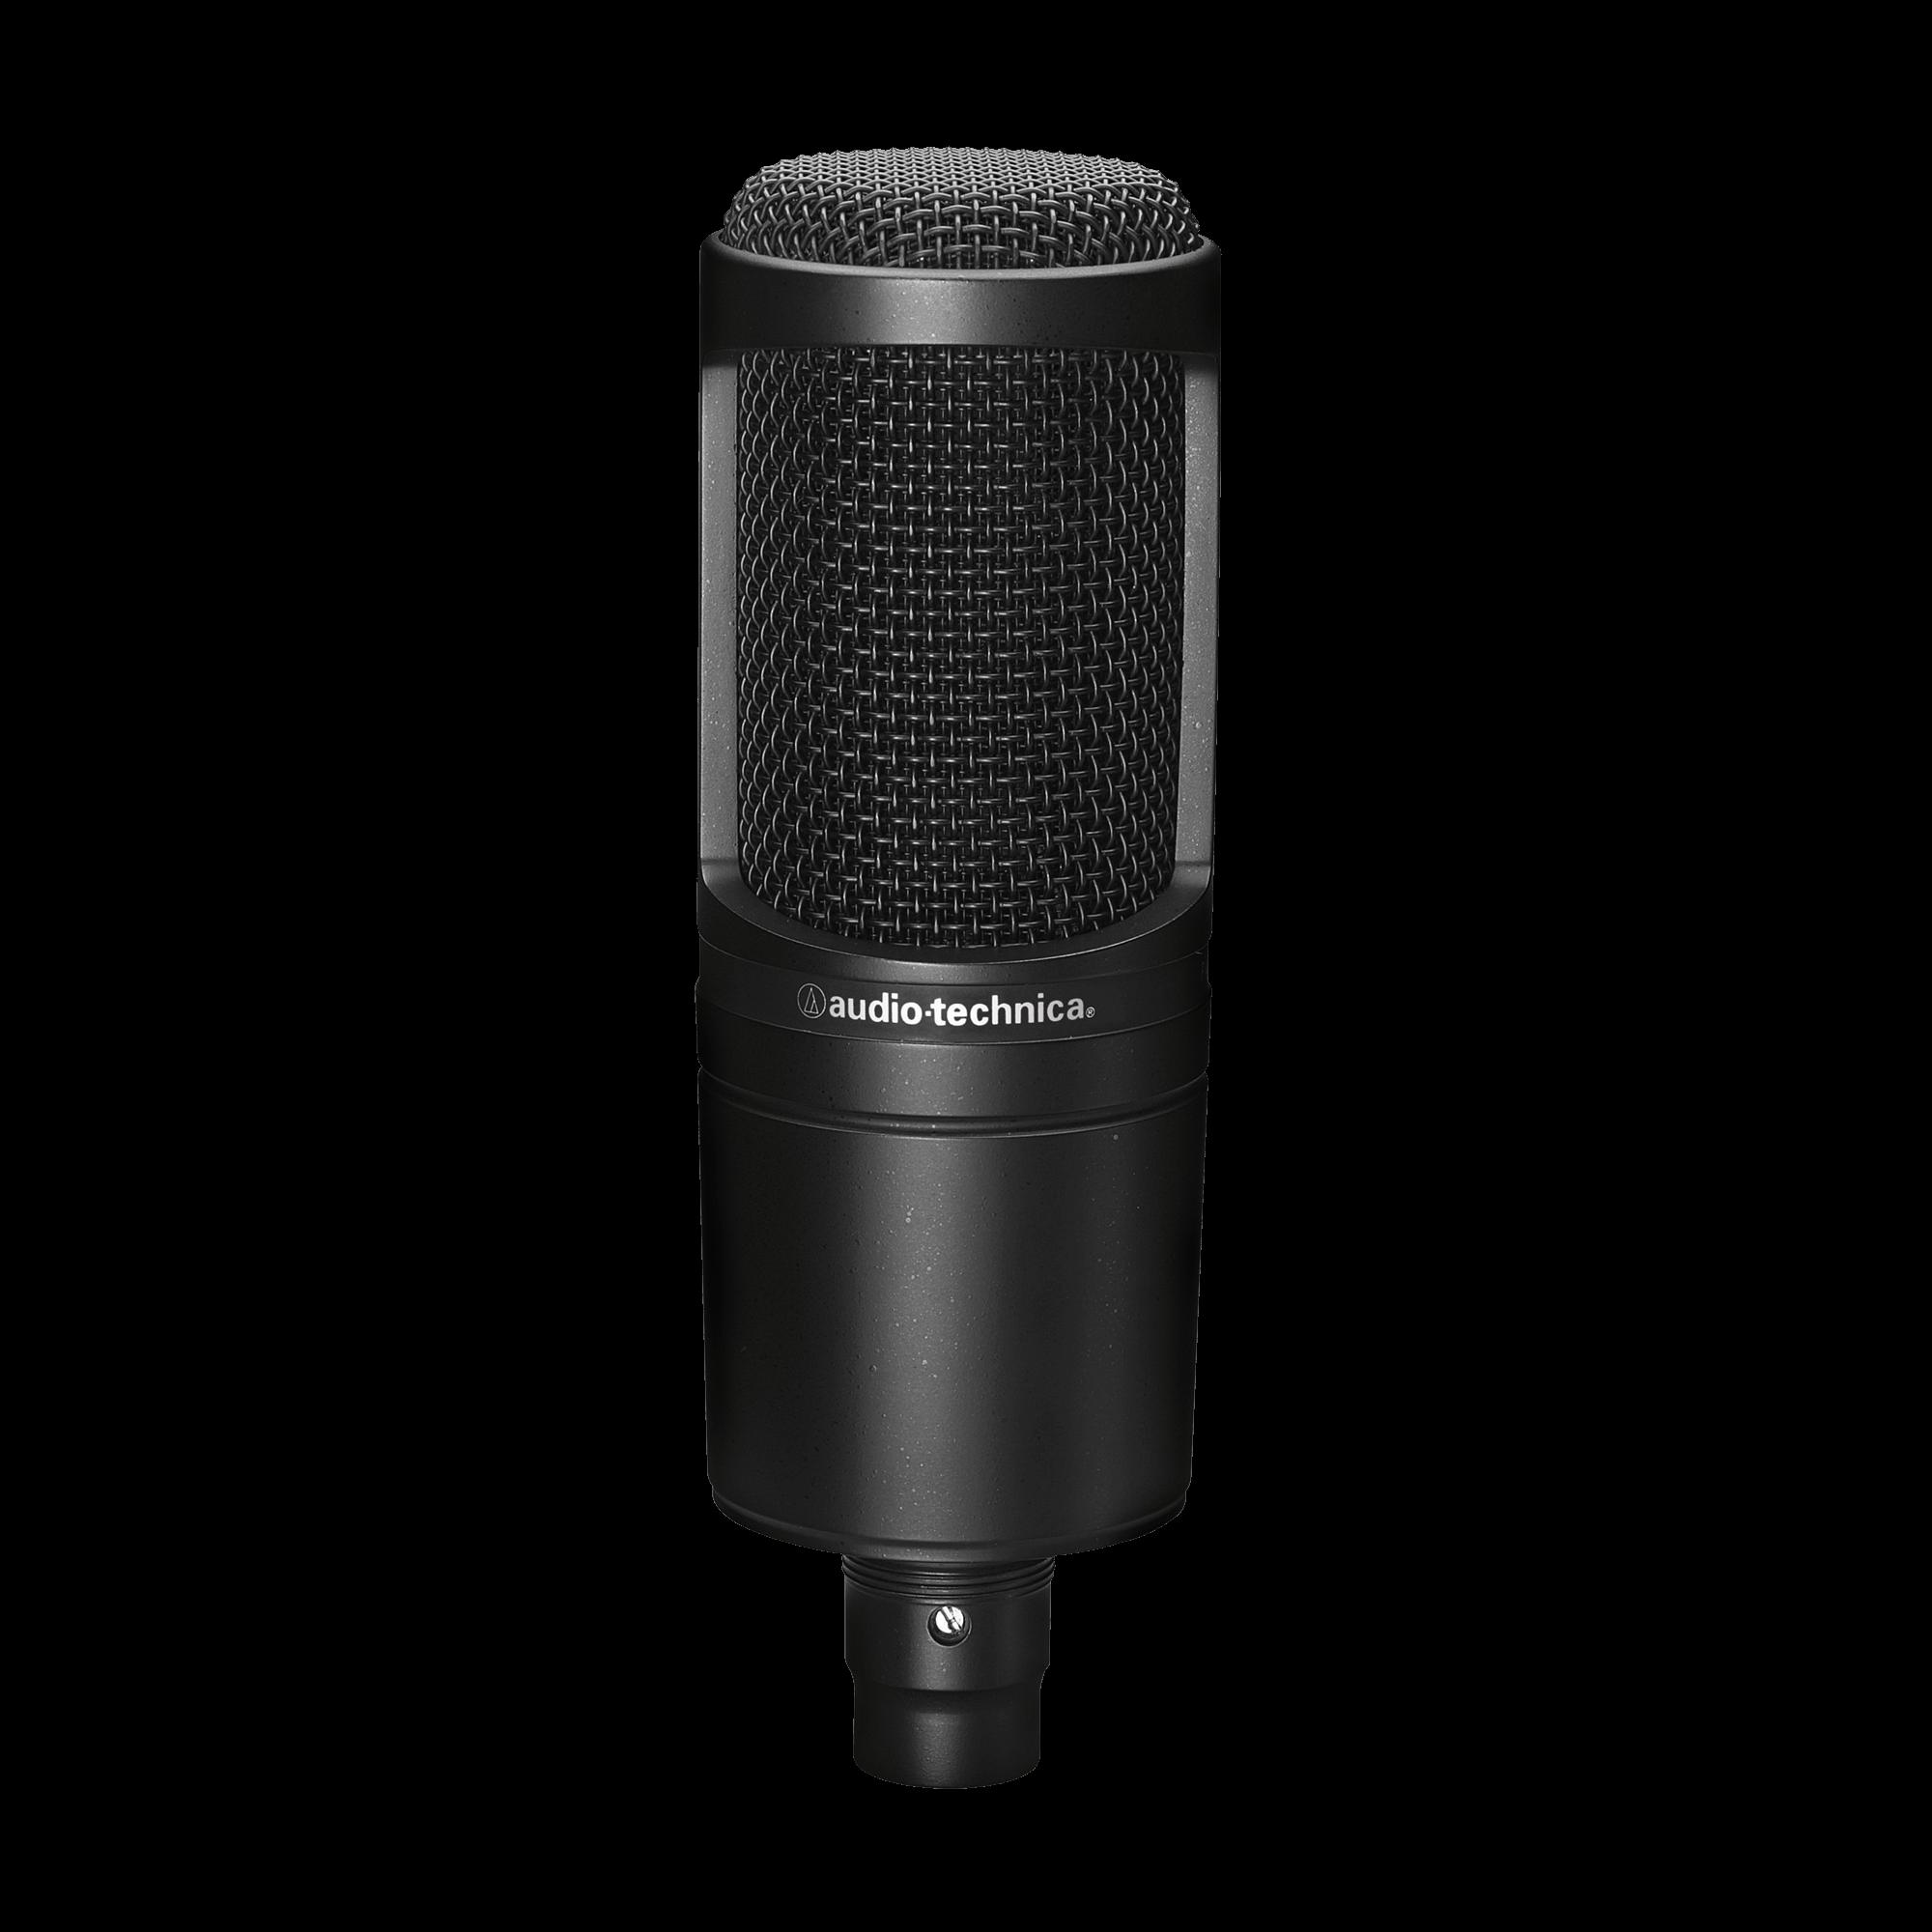 Audio Technica AT2020 Cardioid Large Diaphragm Condenser Microphone